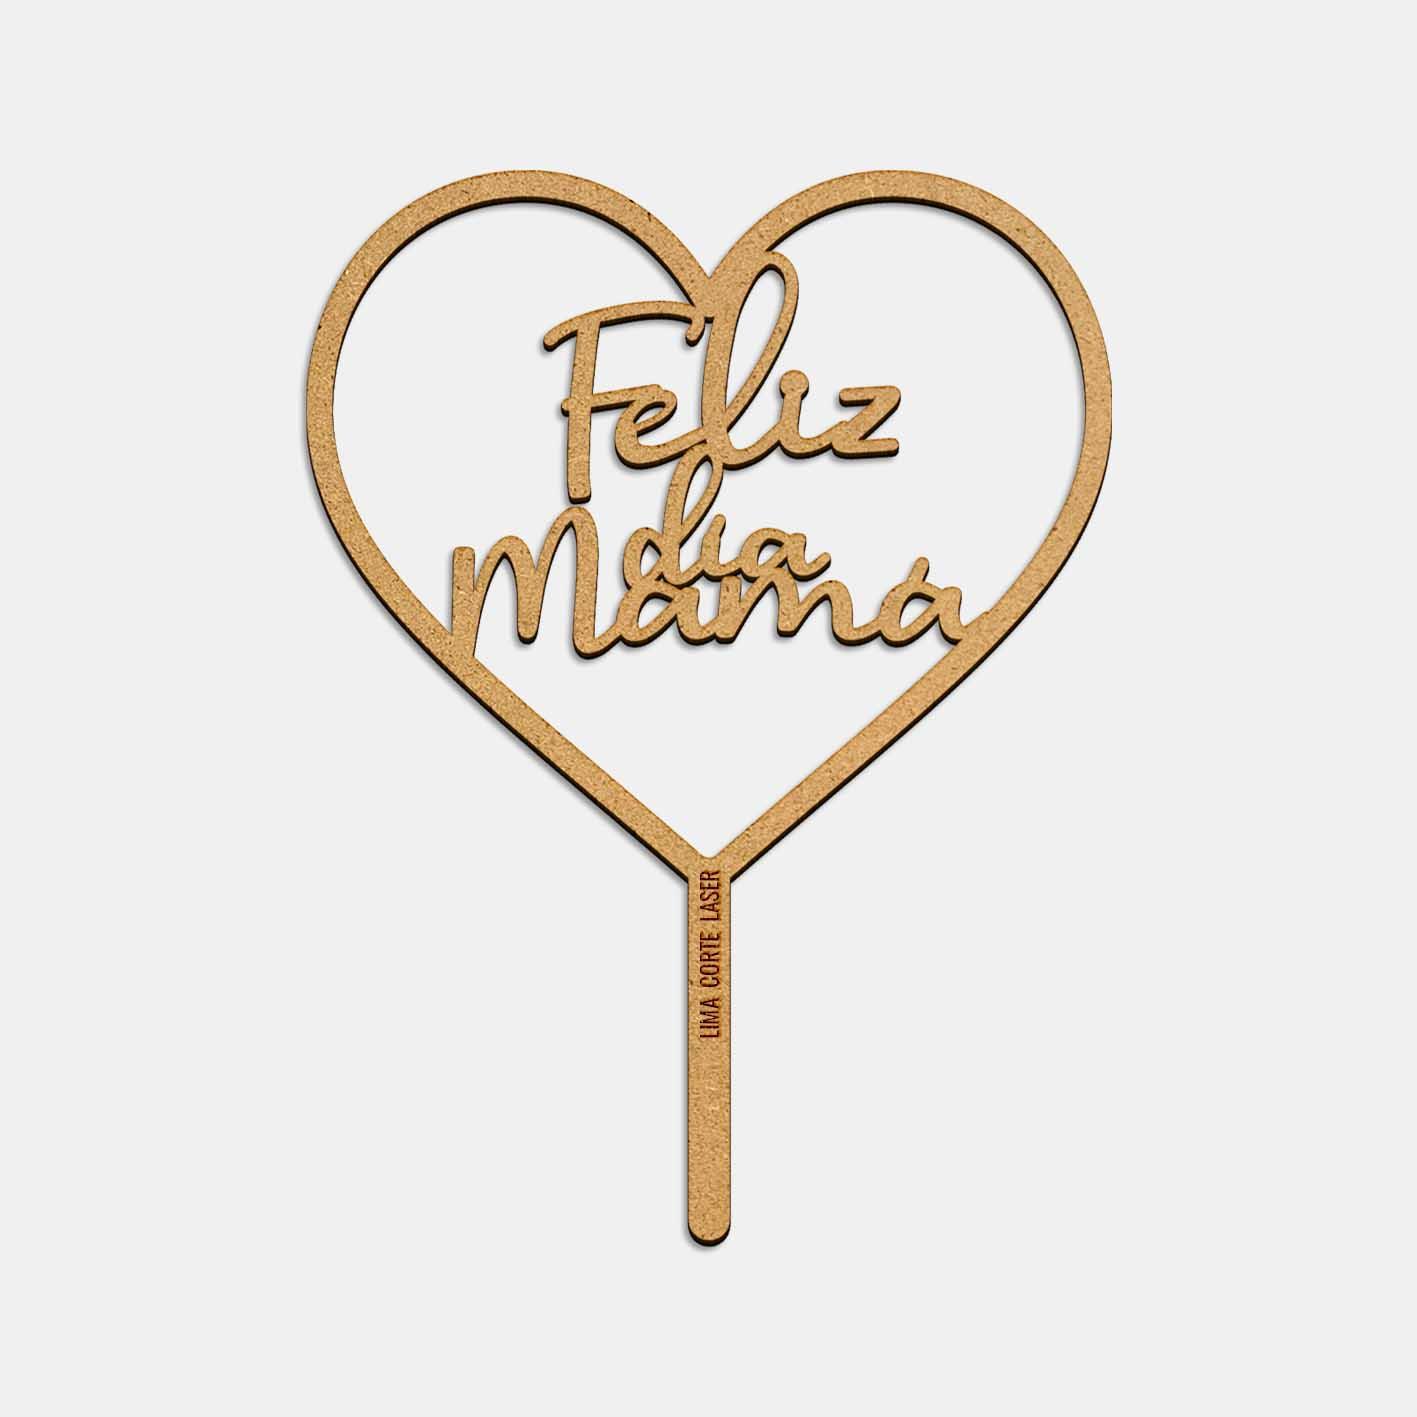 Topper personalizado feliz día mamá con forma de corazón de Lima Corte láser